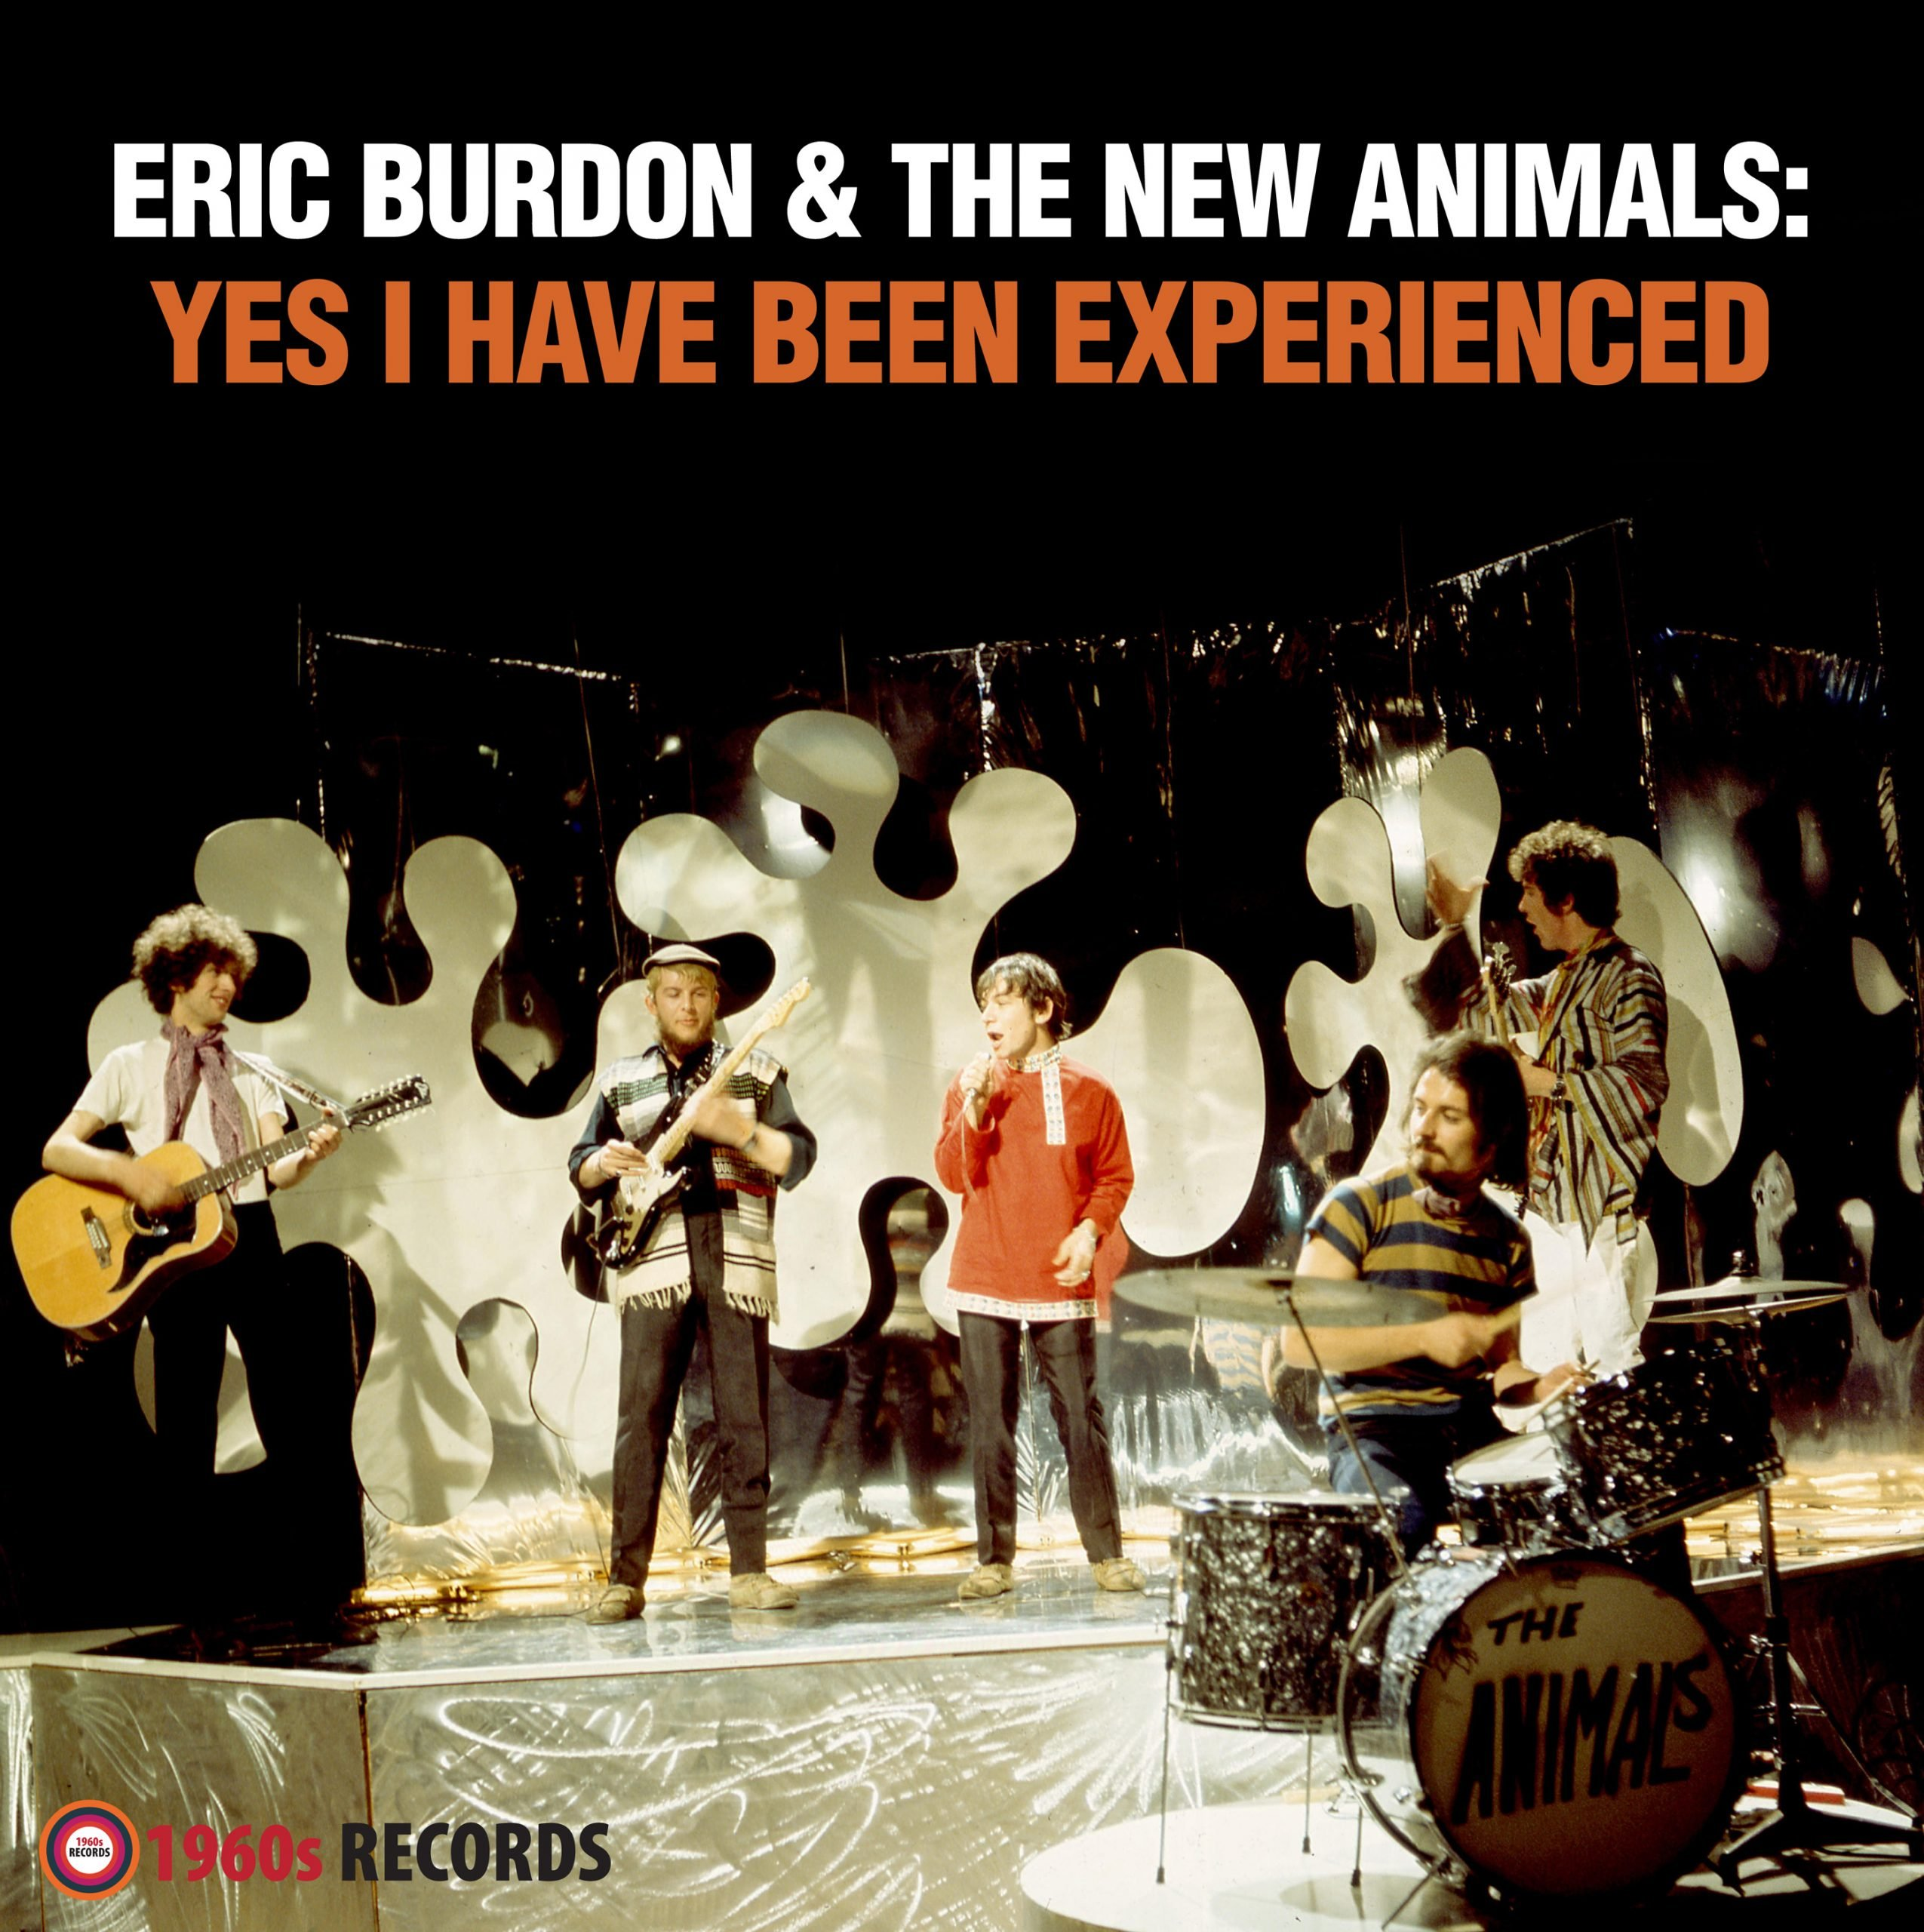 Eric Burdon and The New Animals LP